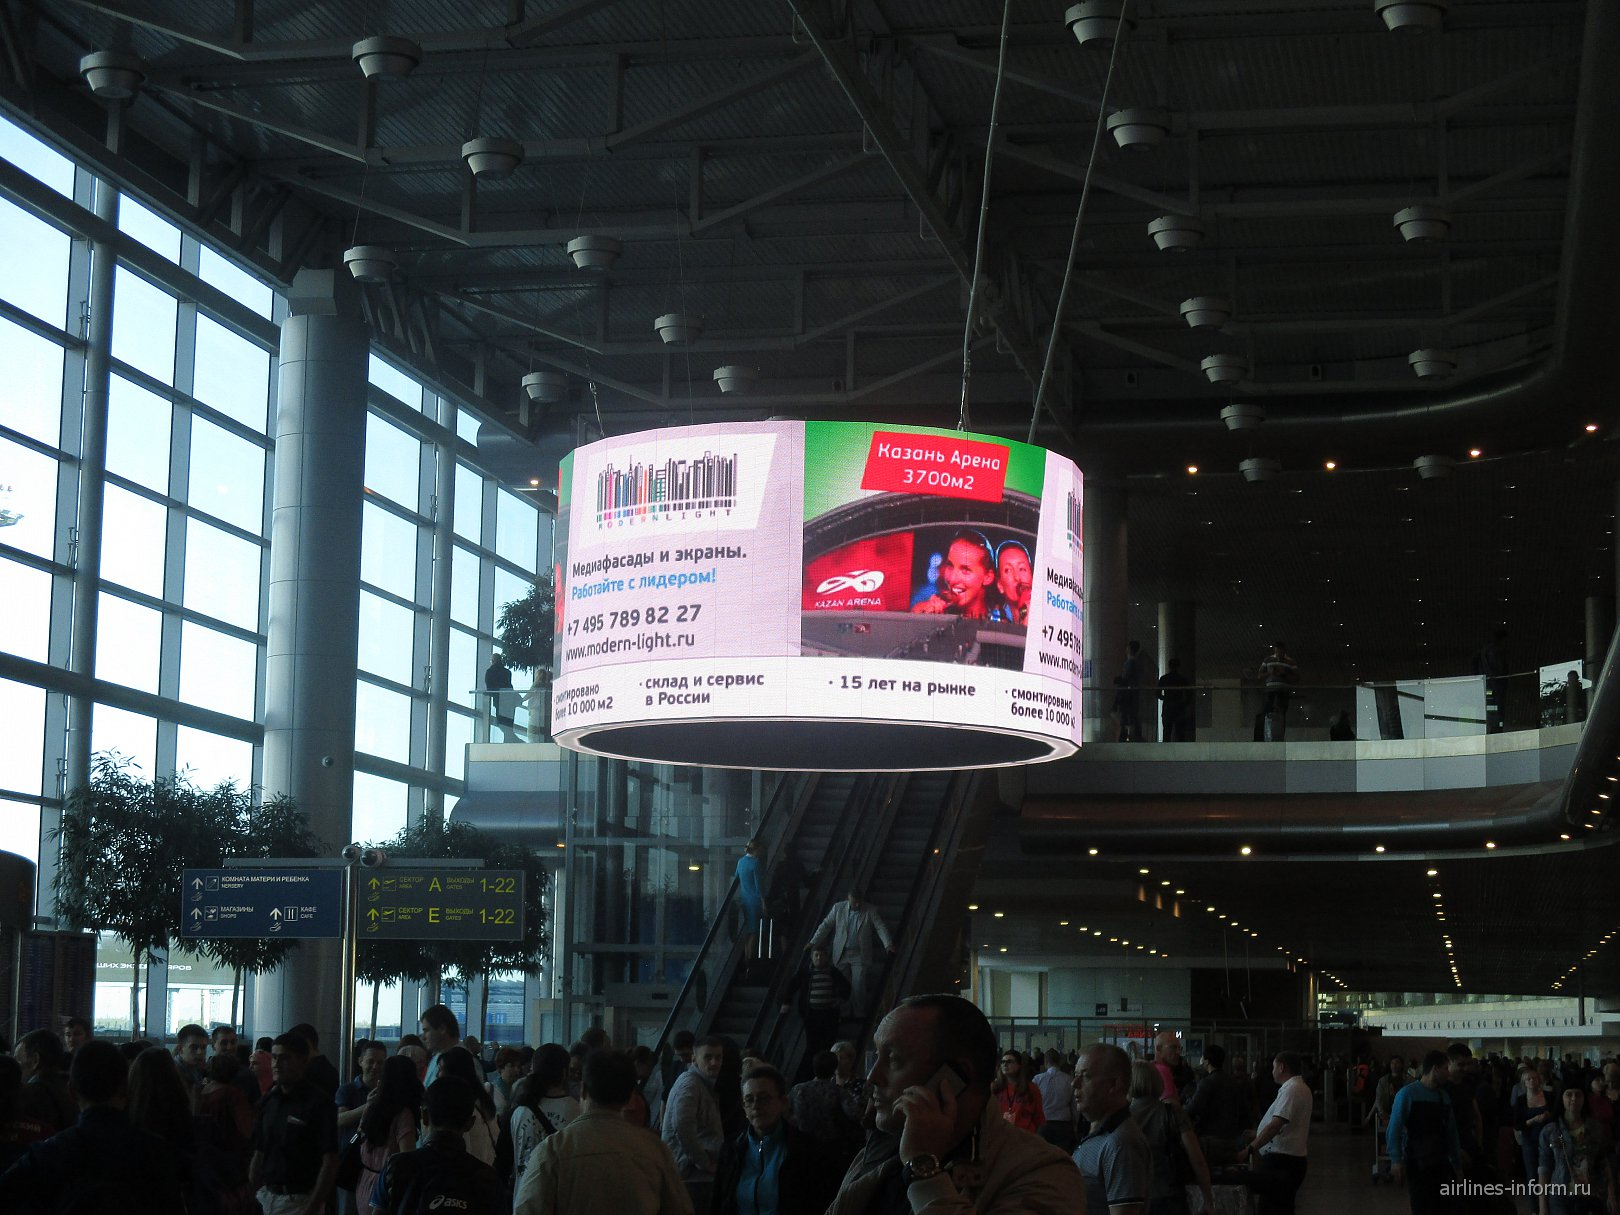 Внутри аэровокзала аэропорта Домодедово